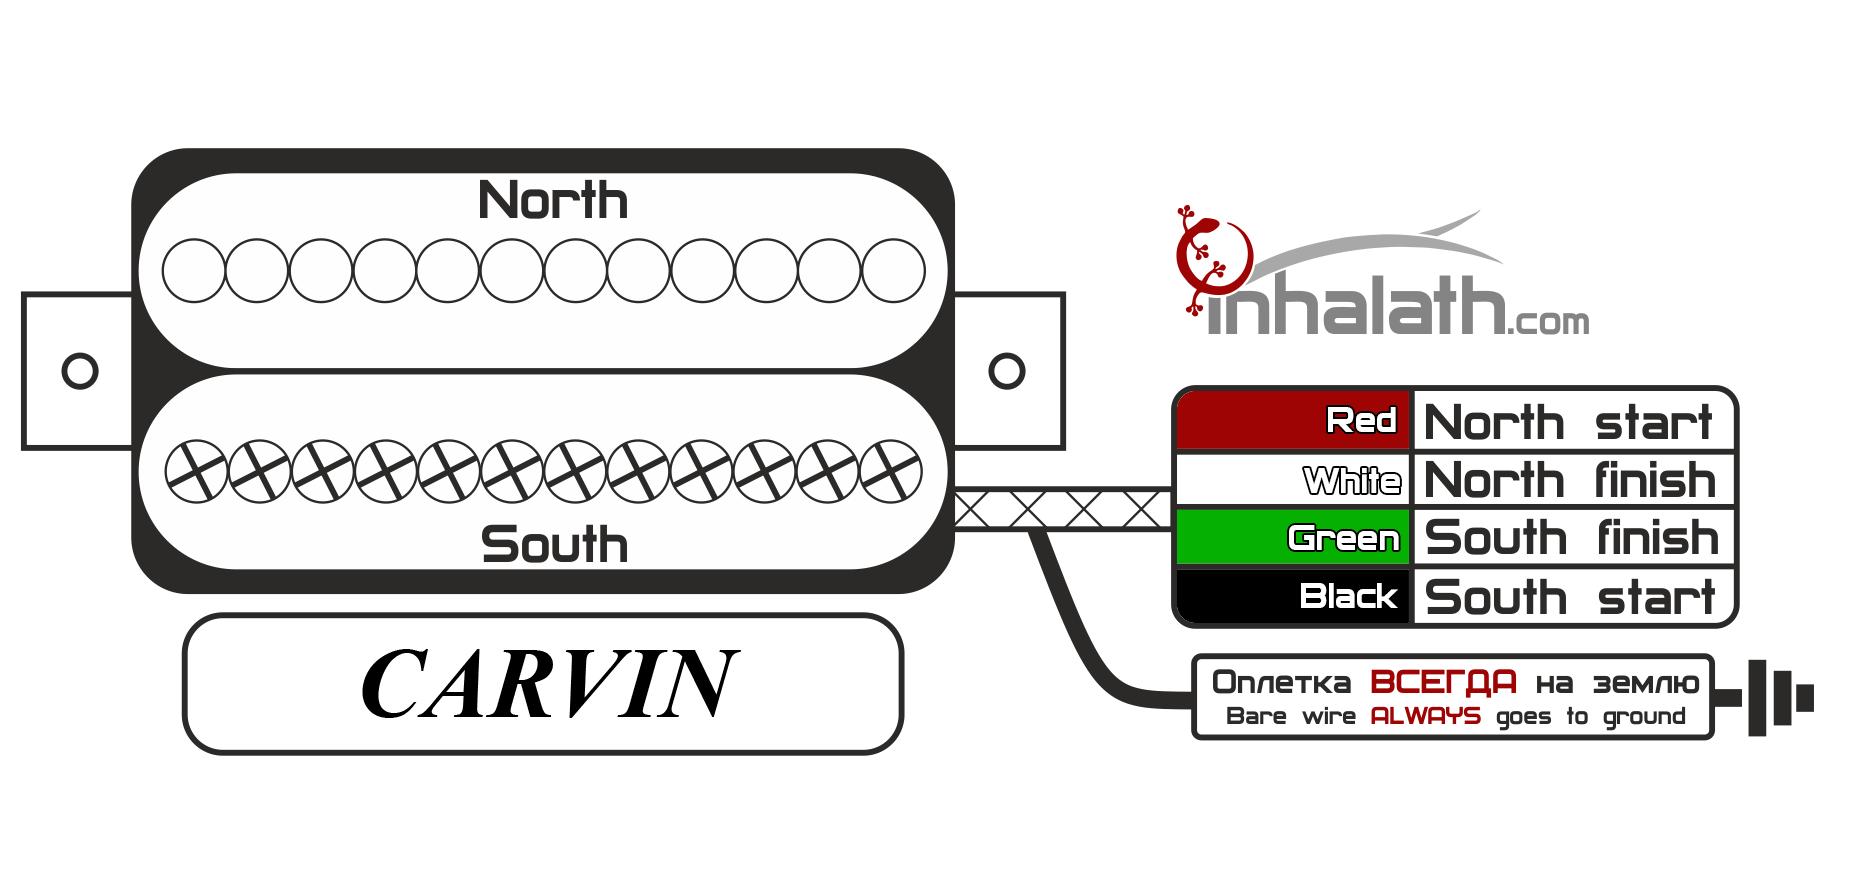 Carvin?resize\\\\\\\\\\\\\\\\\\\\\\\\\\\\\\\\\\\\\\\\\\\\\\\\\\\\\\\\\\\\\\\=665%2C315 gilbarco advantage wiring diagram gilbarco encore 300 \u2022 wiring carvin wiring diagrams at eliteediting.co